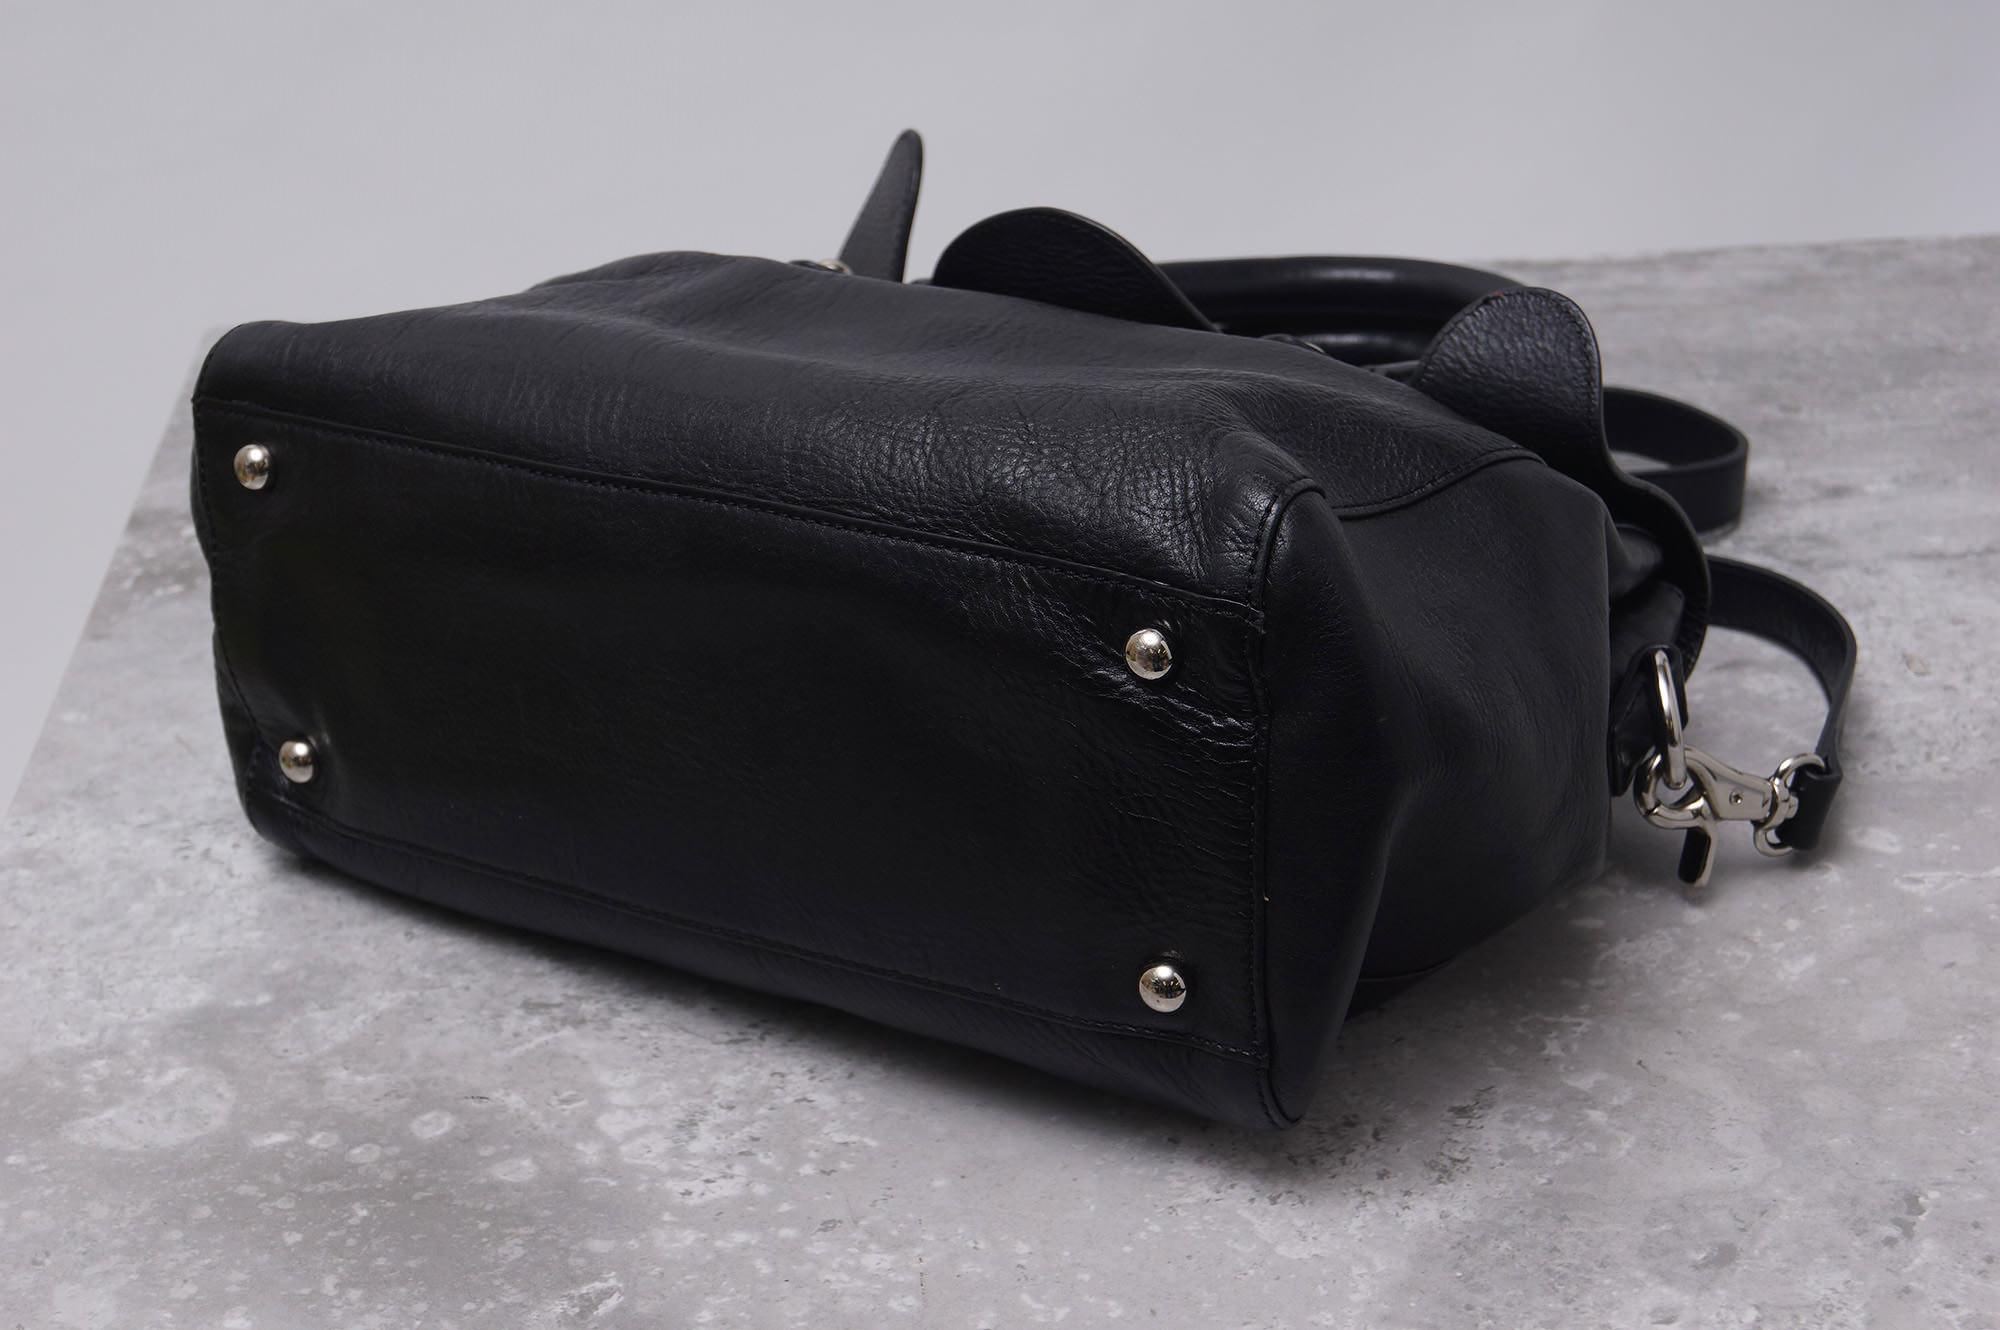 85e07a51ca1e モダルー / MODALU ショルダーバッグ レディース ブラック 黒 SKIPTON ...